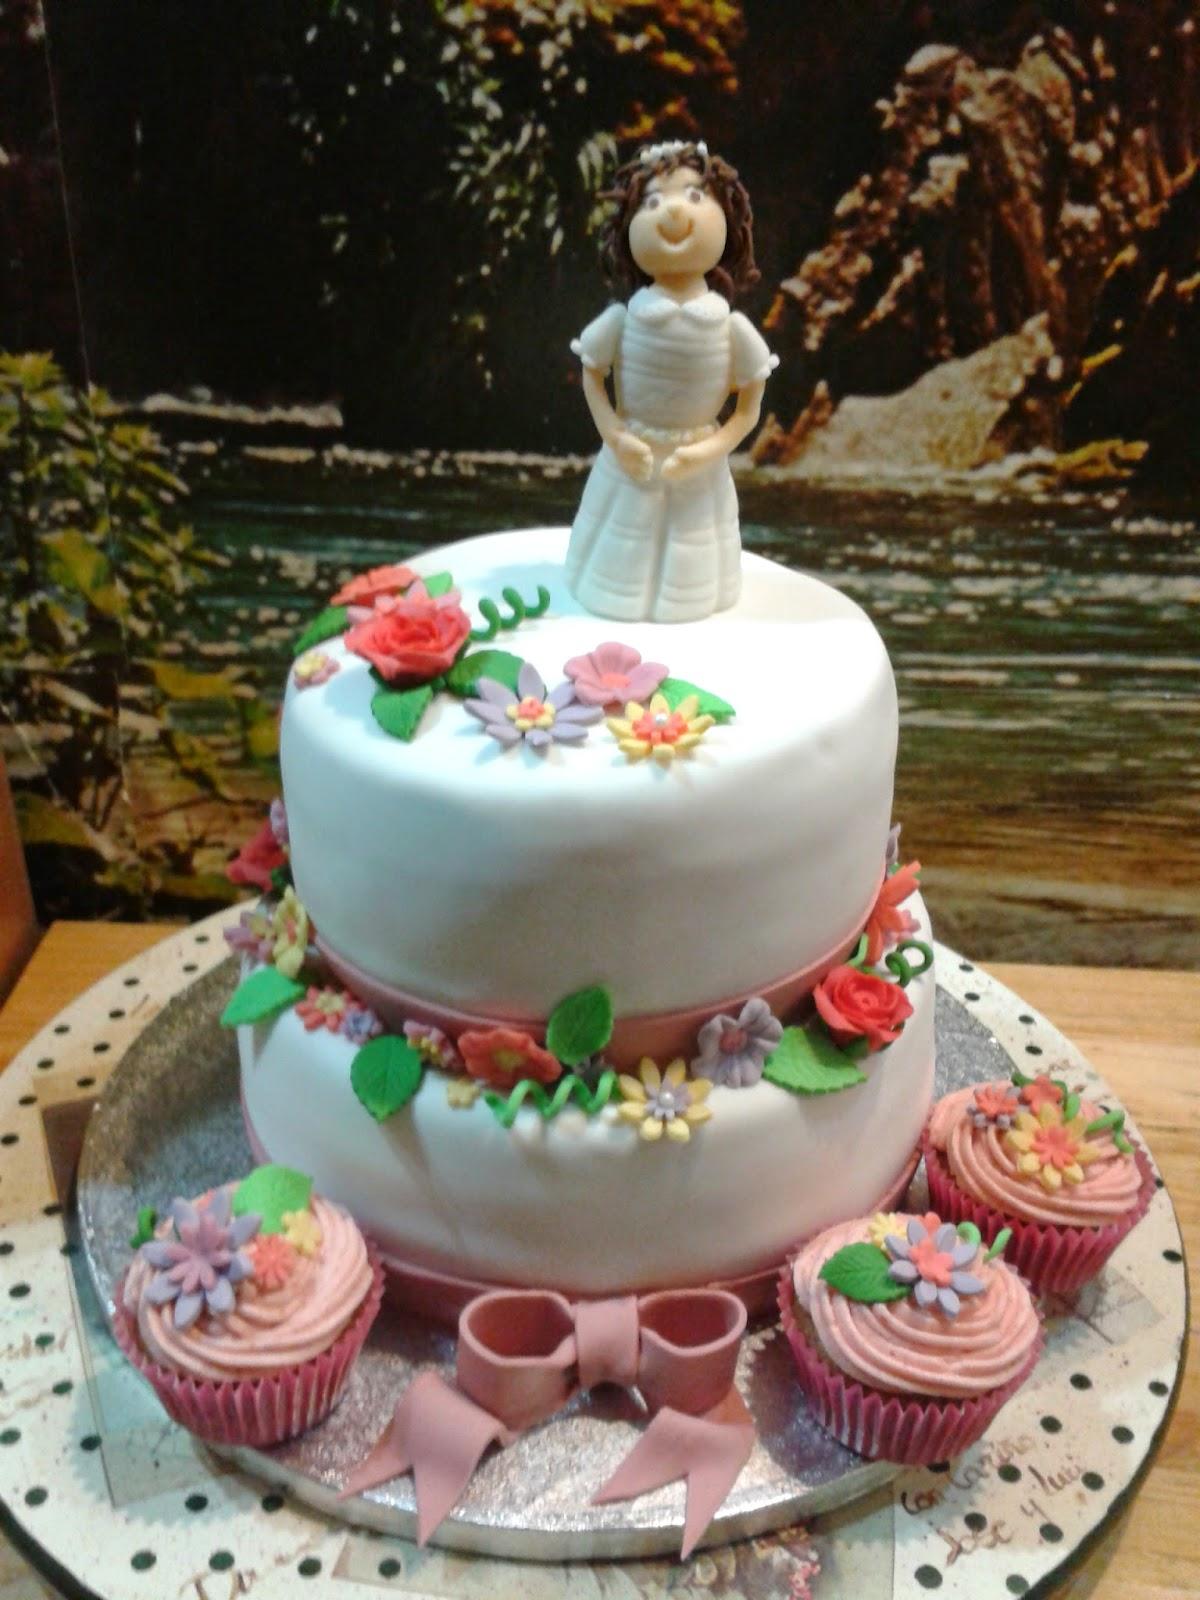 Cupcakes tenerife tarta comuni n floral - Cupcakes tenerife ...